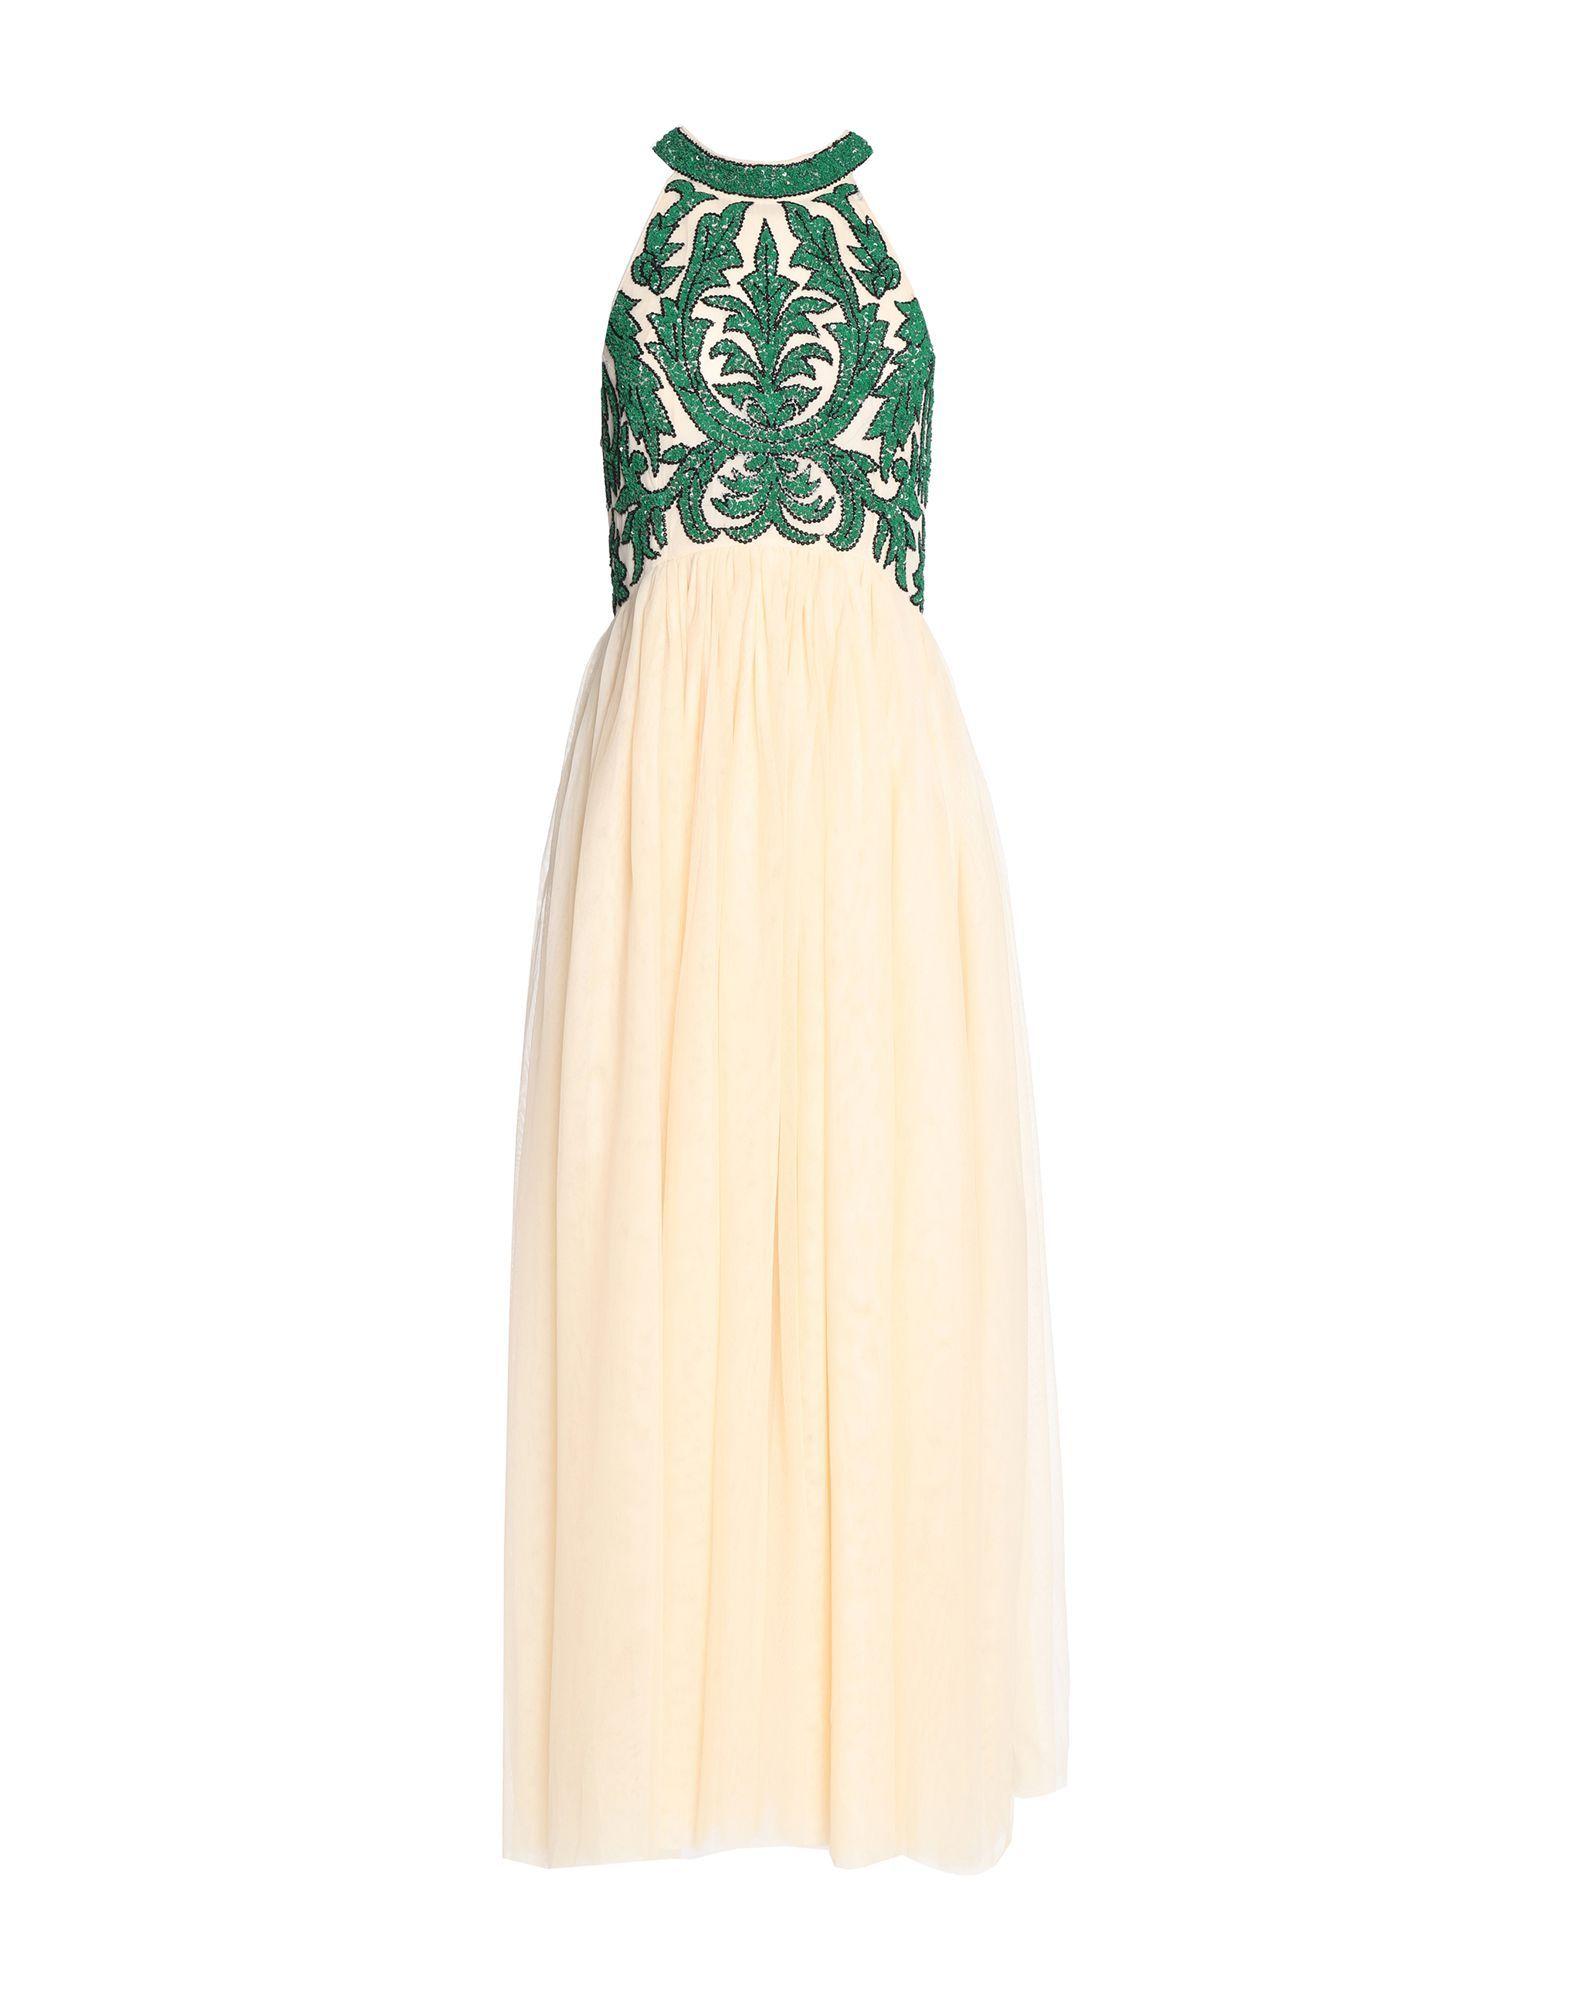 Ganni Beige Crepe With Sequins Full Length Dress